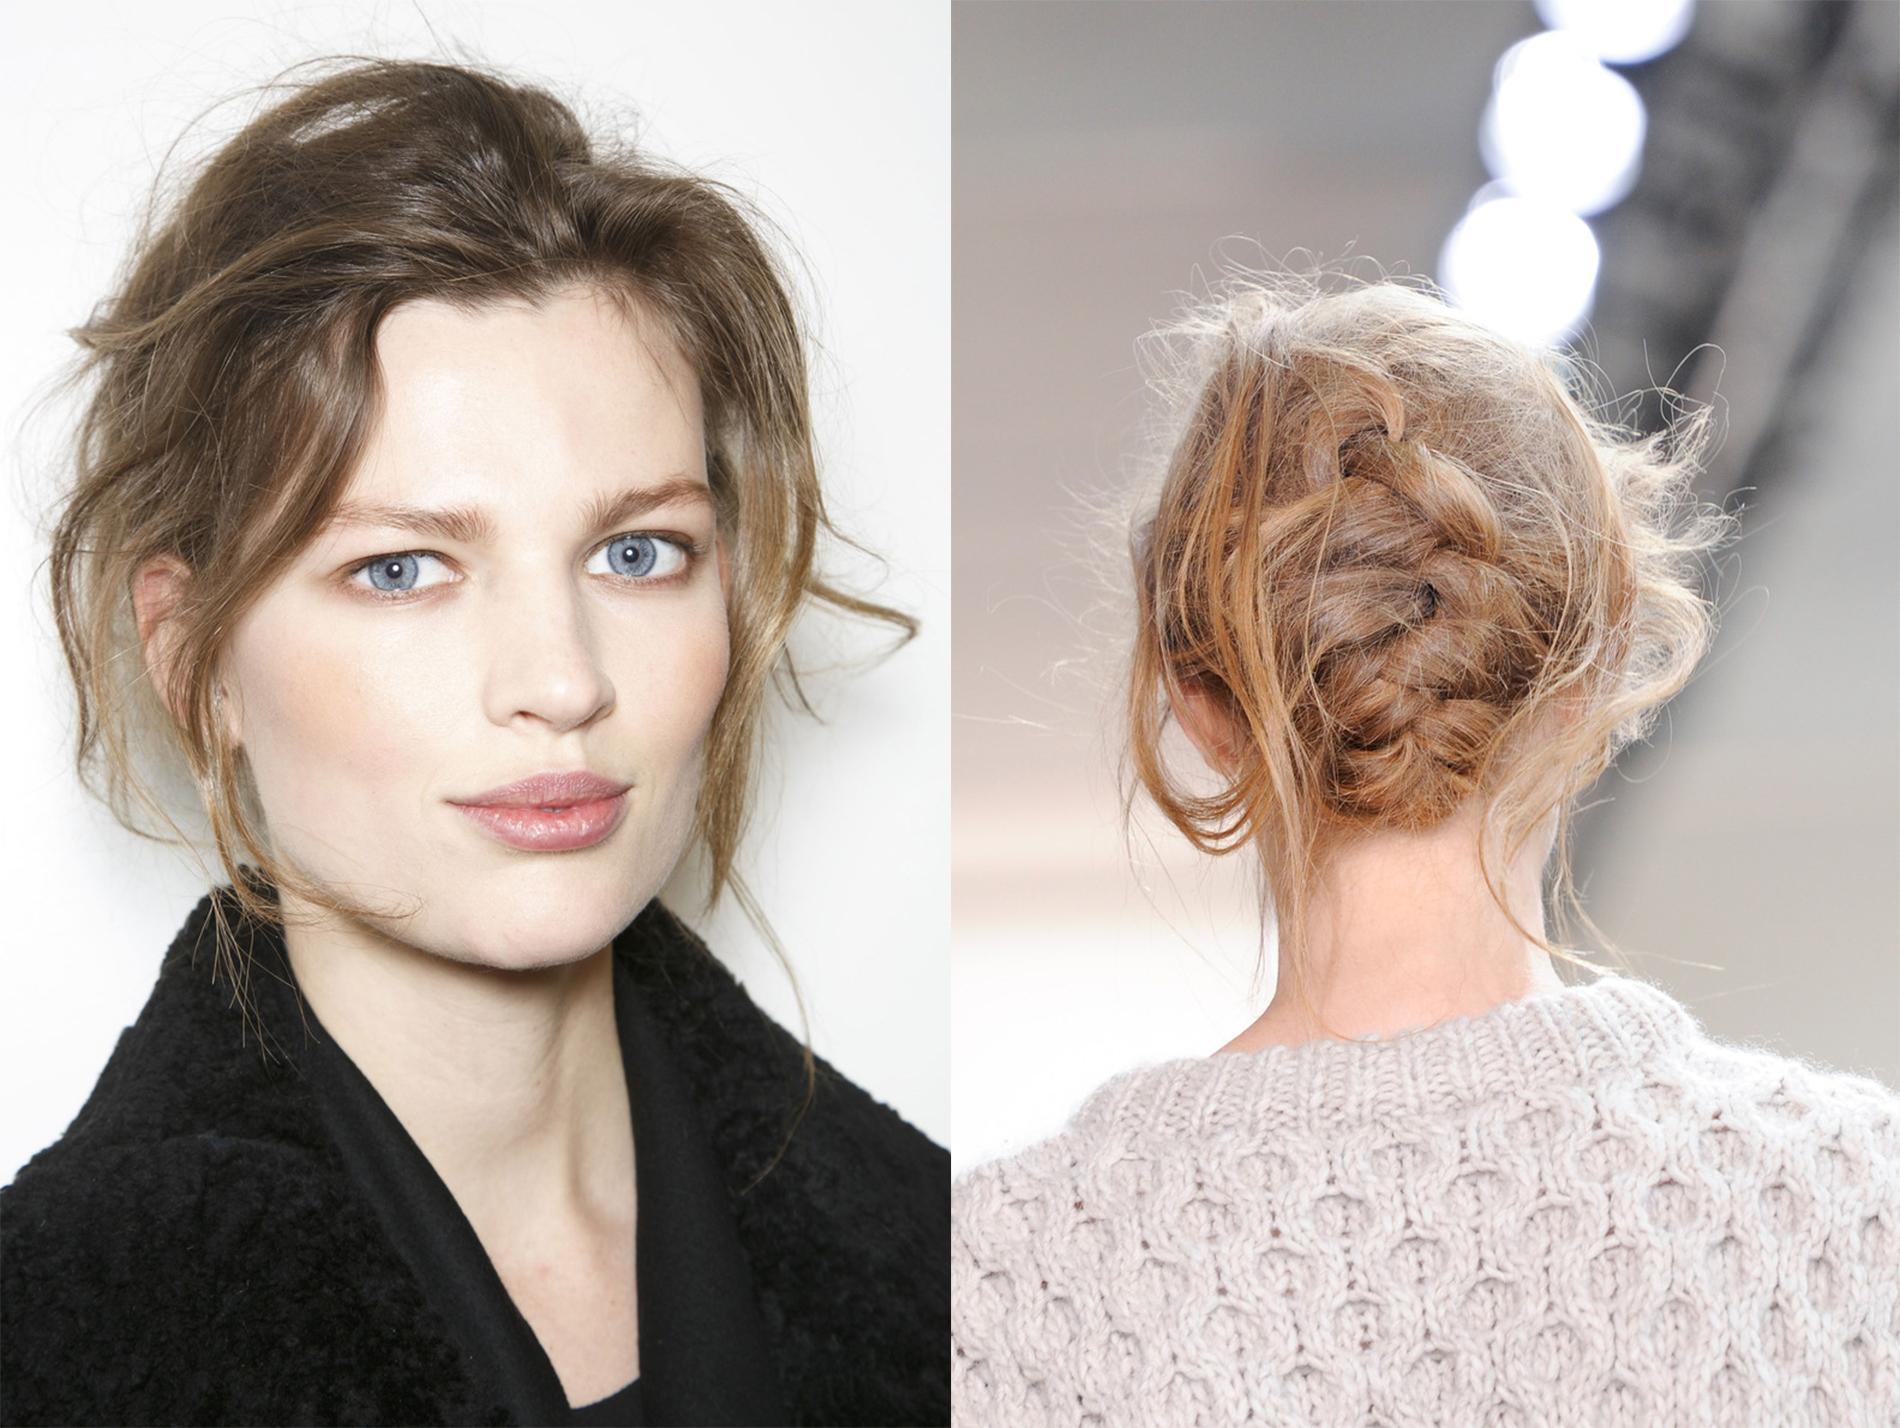 Les coiffures zéro effort, tendance de la rentrée - Madame Figaro